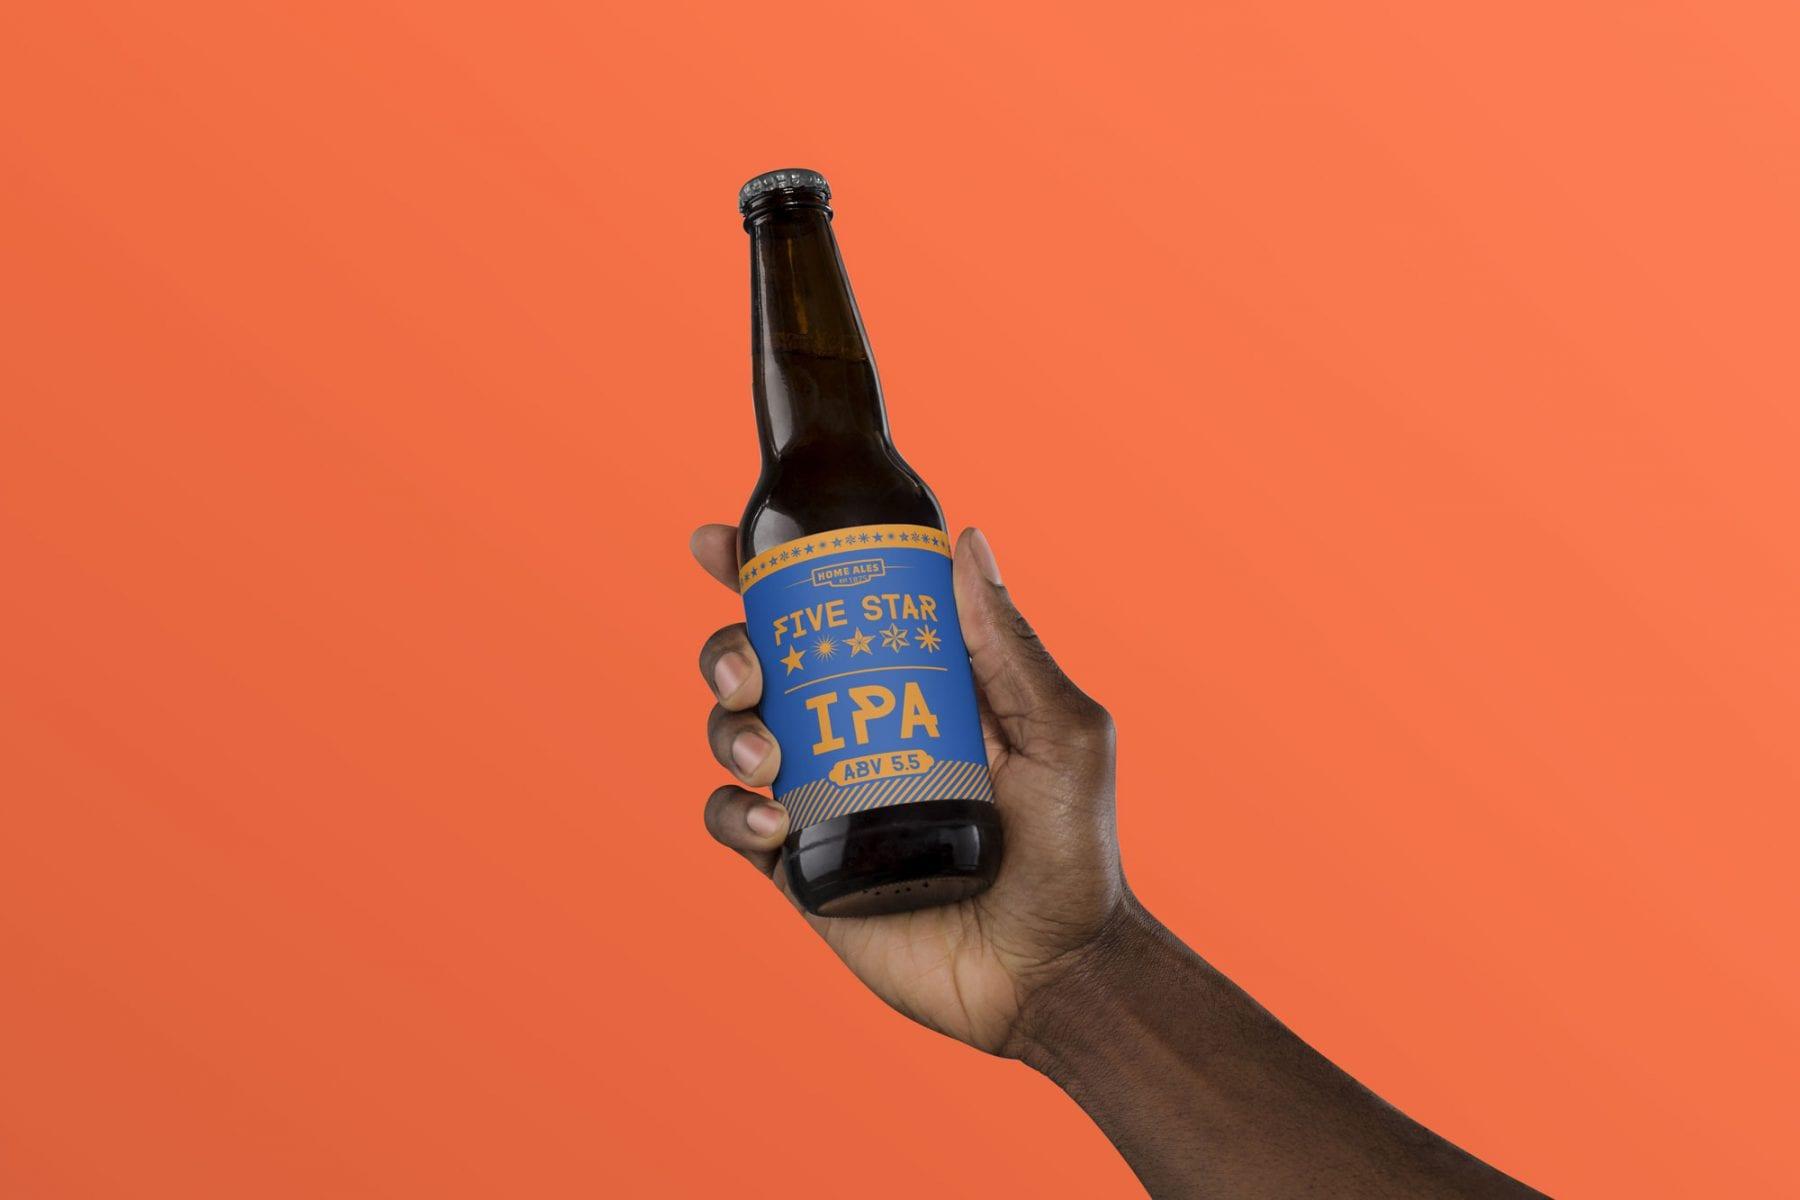 Design for Five Star IPA bottle label designed by branding designer and graphic designer Jessica Croome of Perth, WA